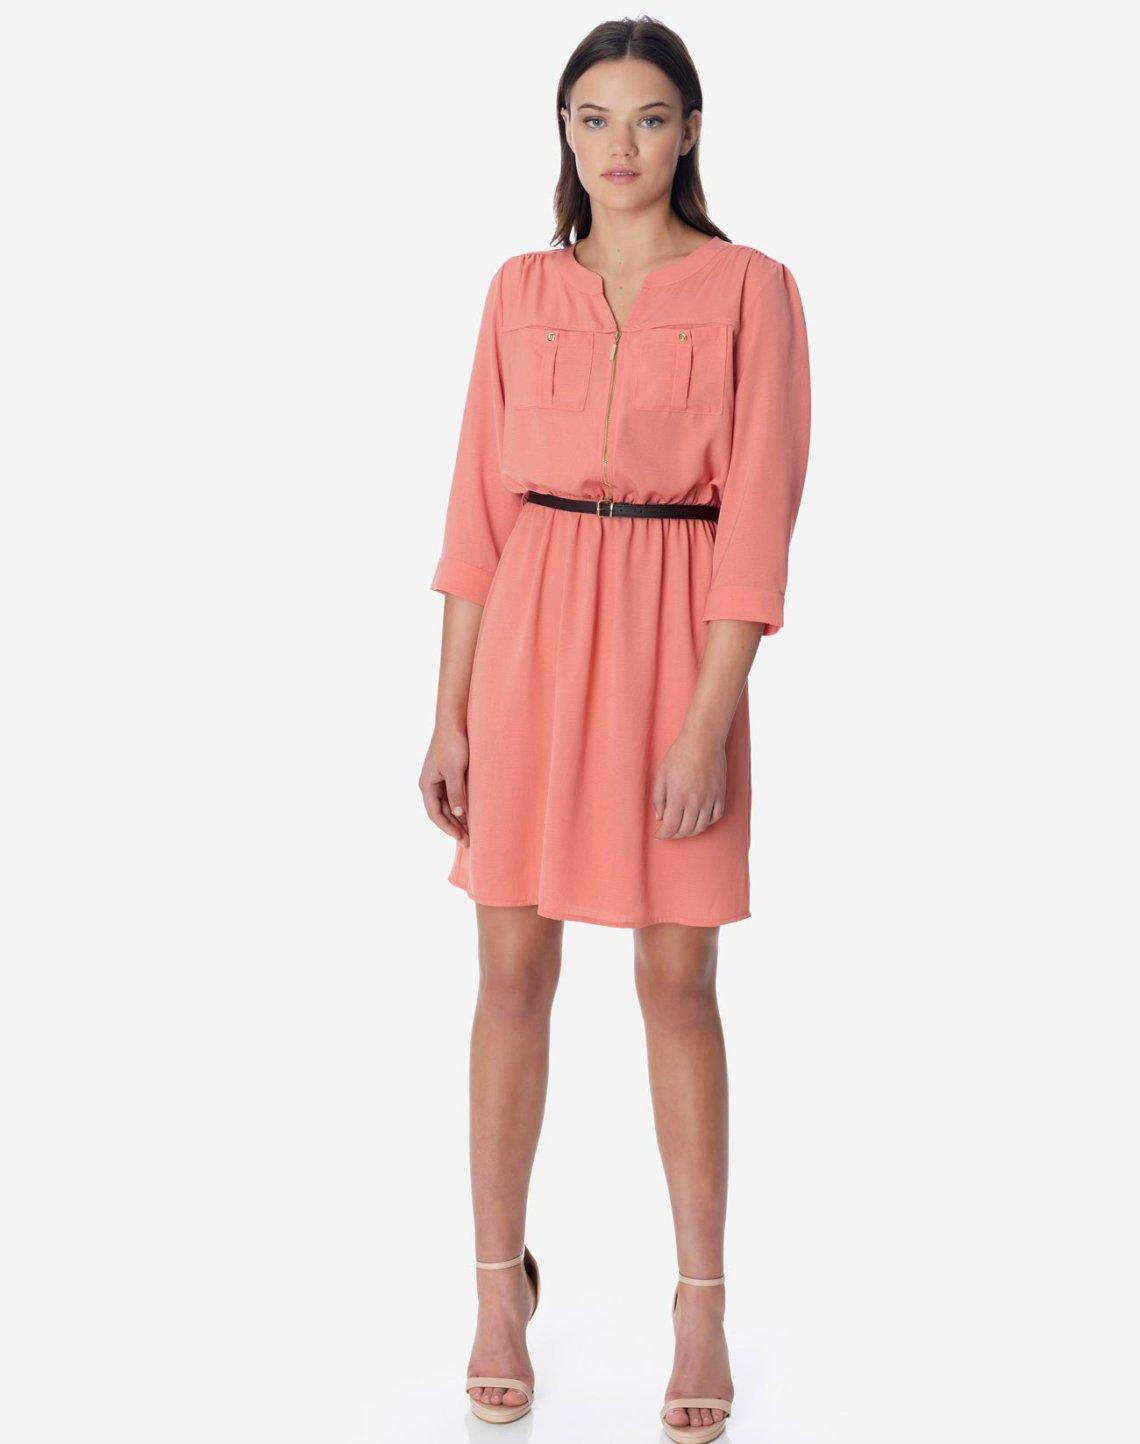 Mini dress with zip